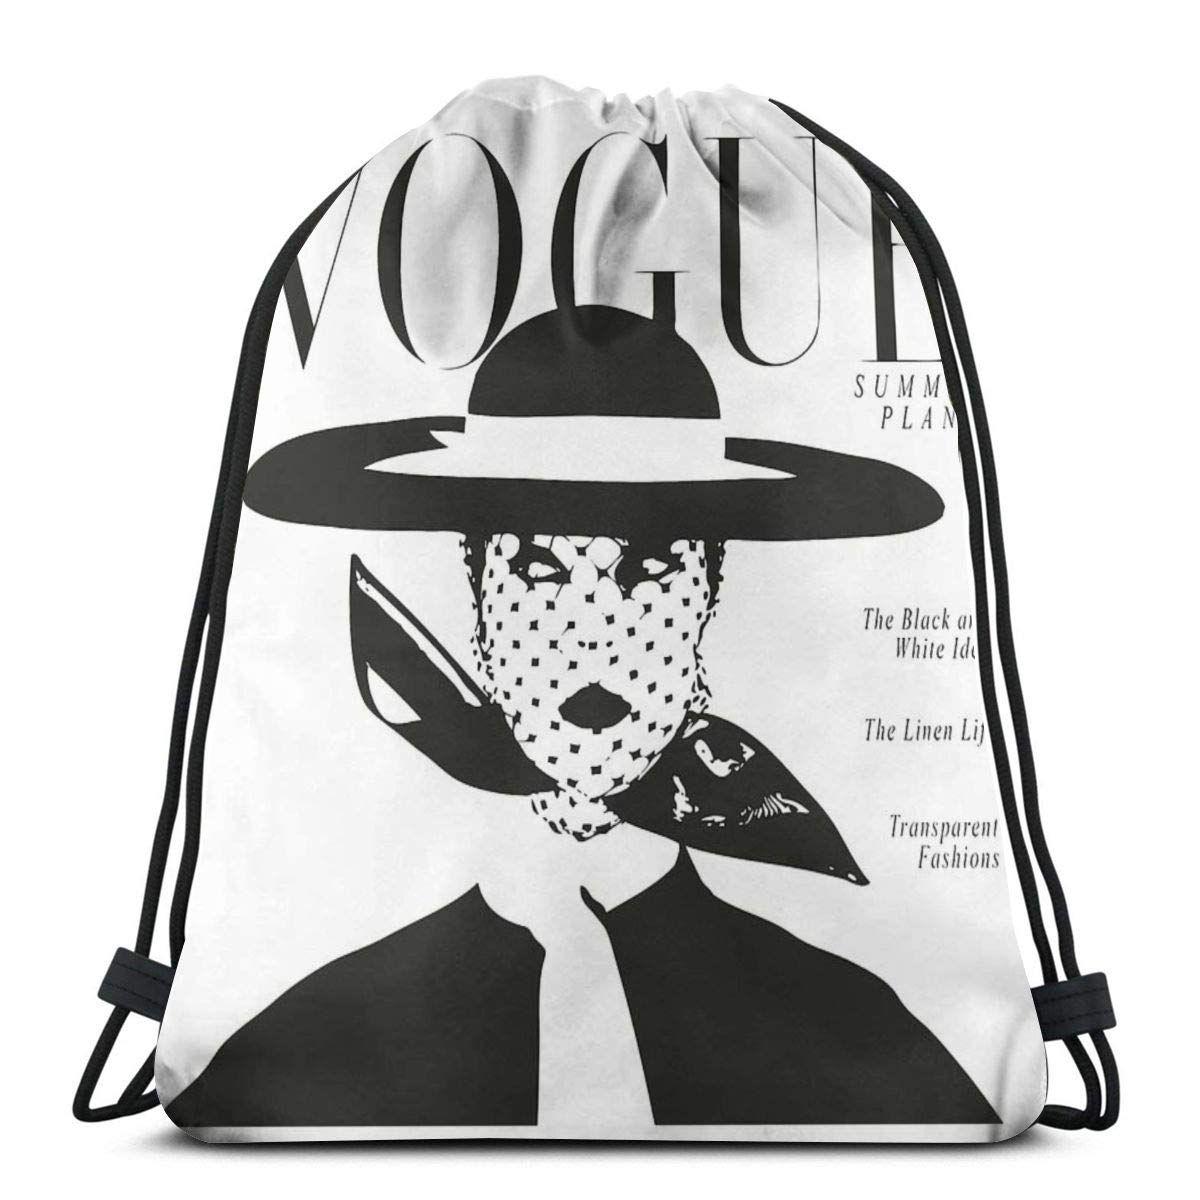 Photo of Betty Vintage Vogue Cover Fashion Magazine Art Editorial Drawstring Bags Gym Bag